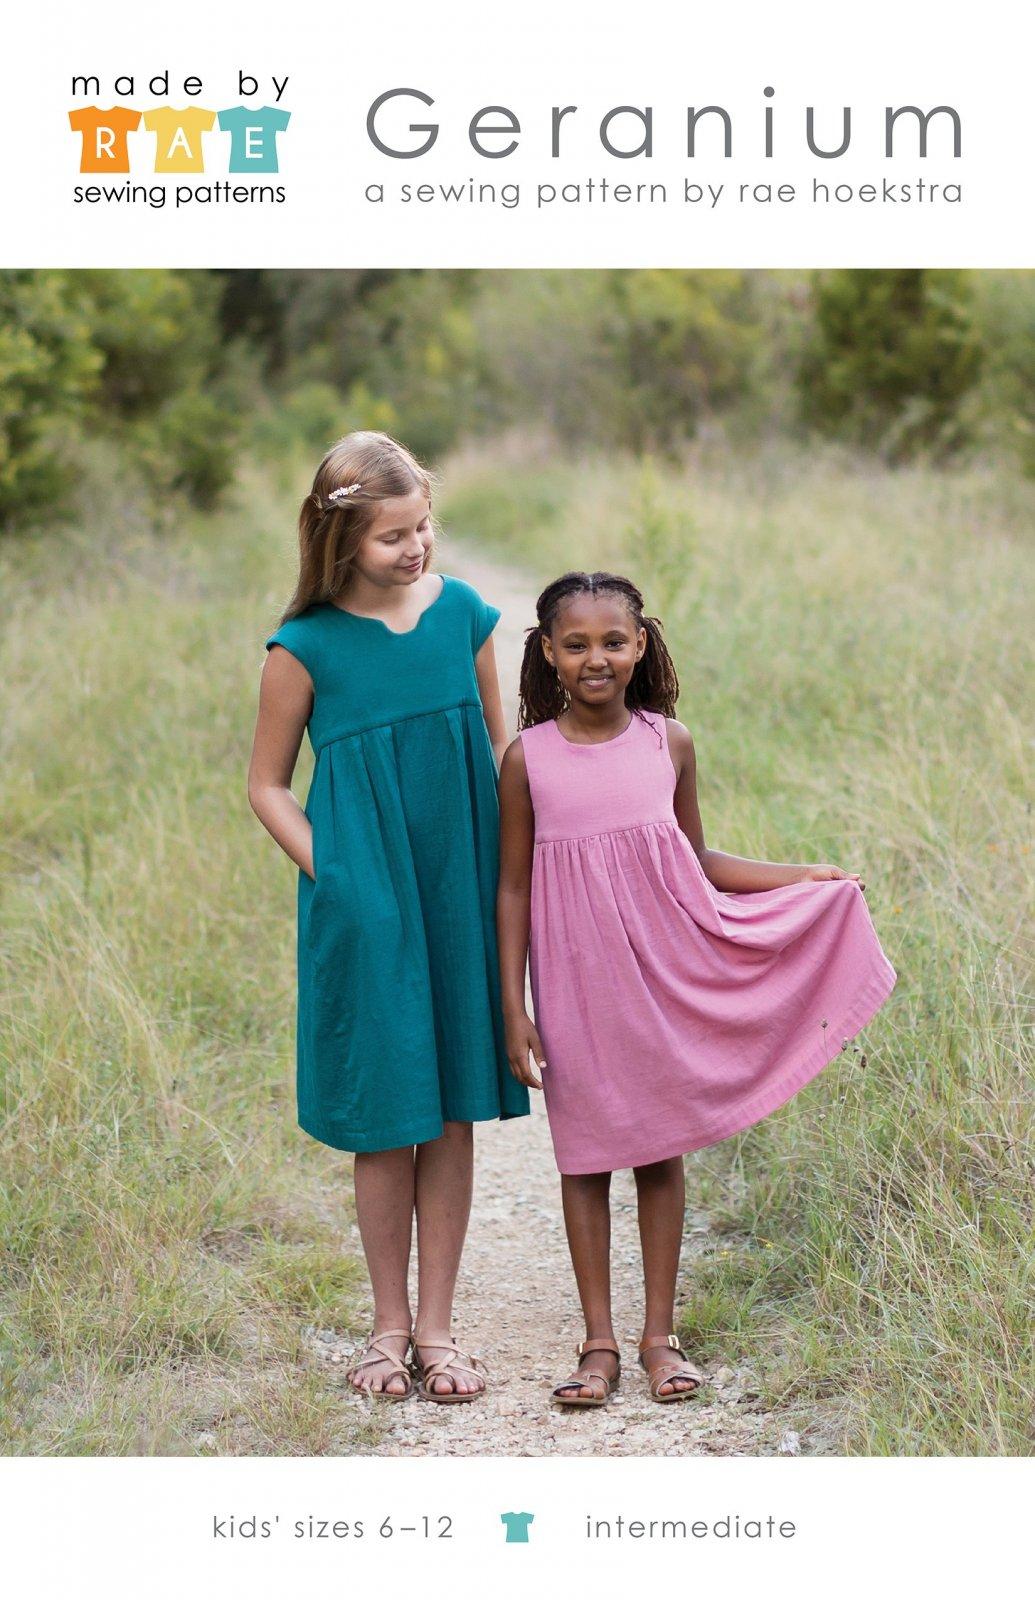 Made by Rae - Geranium Dress (Sizes 6-12)